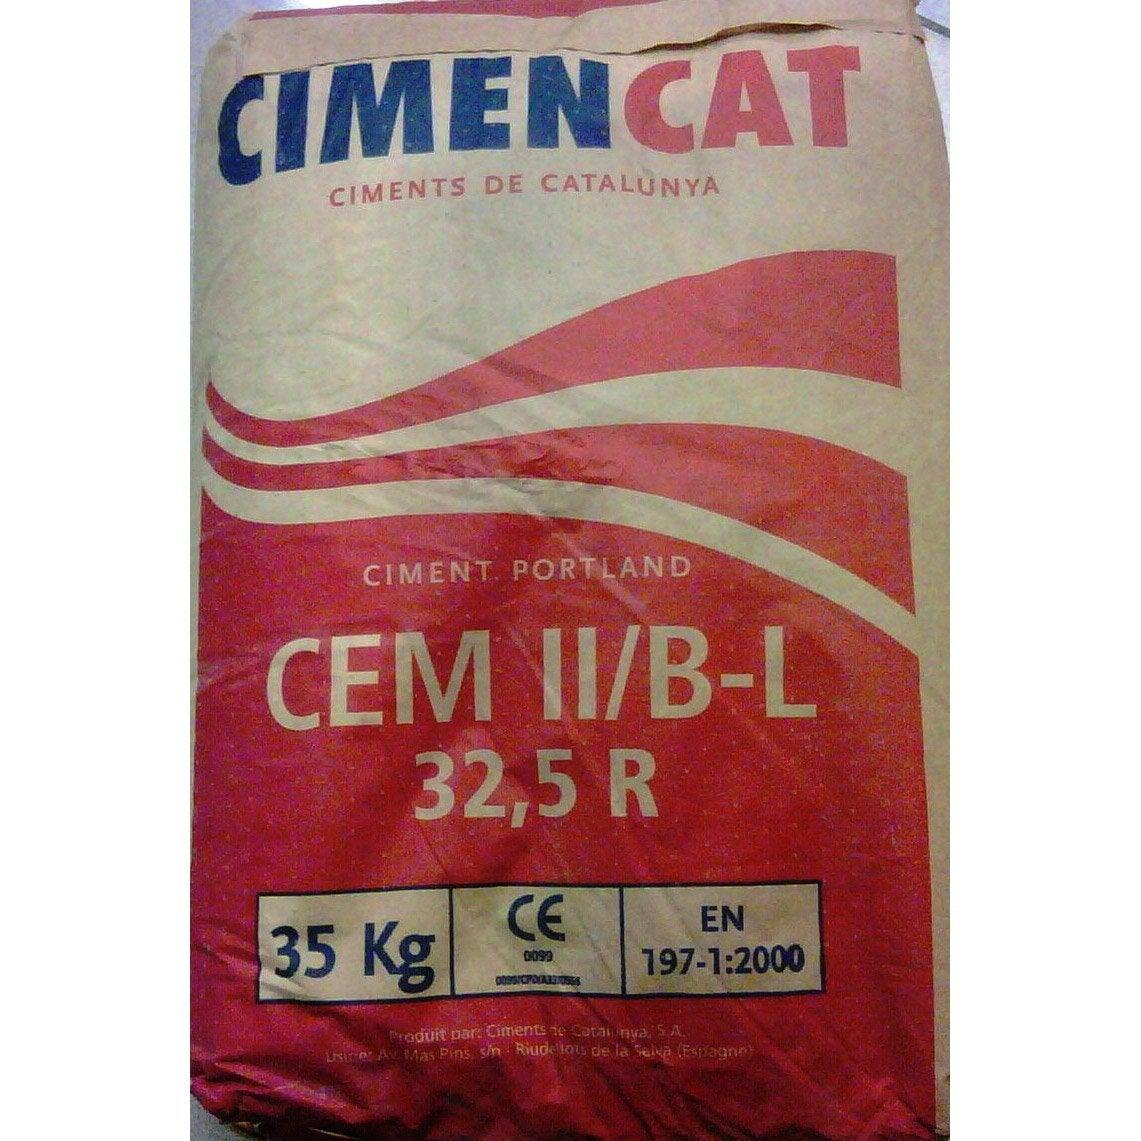 Ciment gris ce cimencat 35 kg leroy merlin - Ciment prompt leroy merlin ...